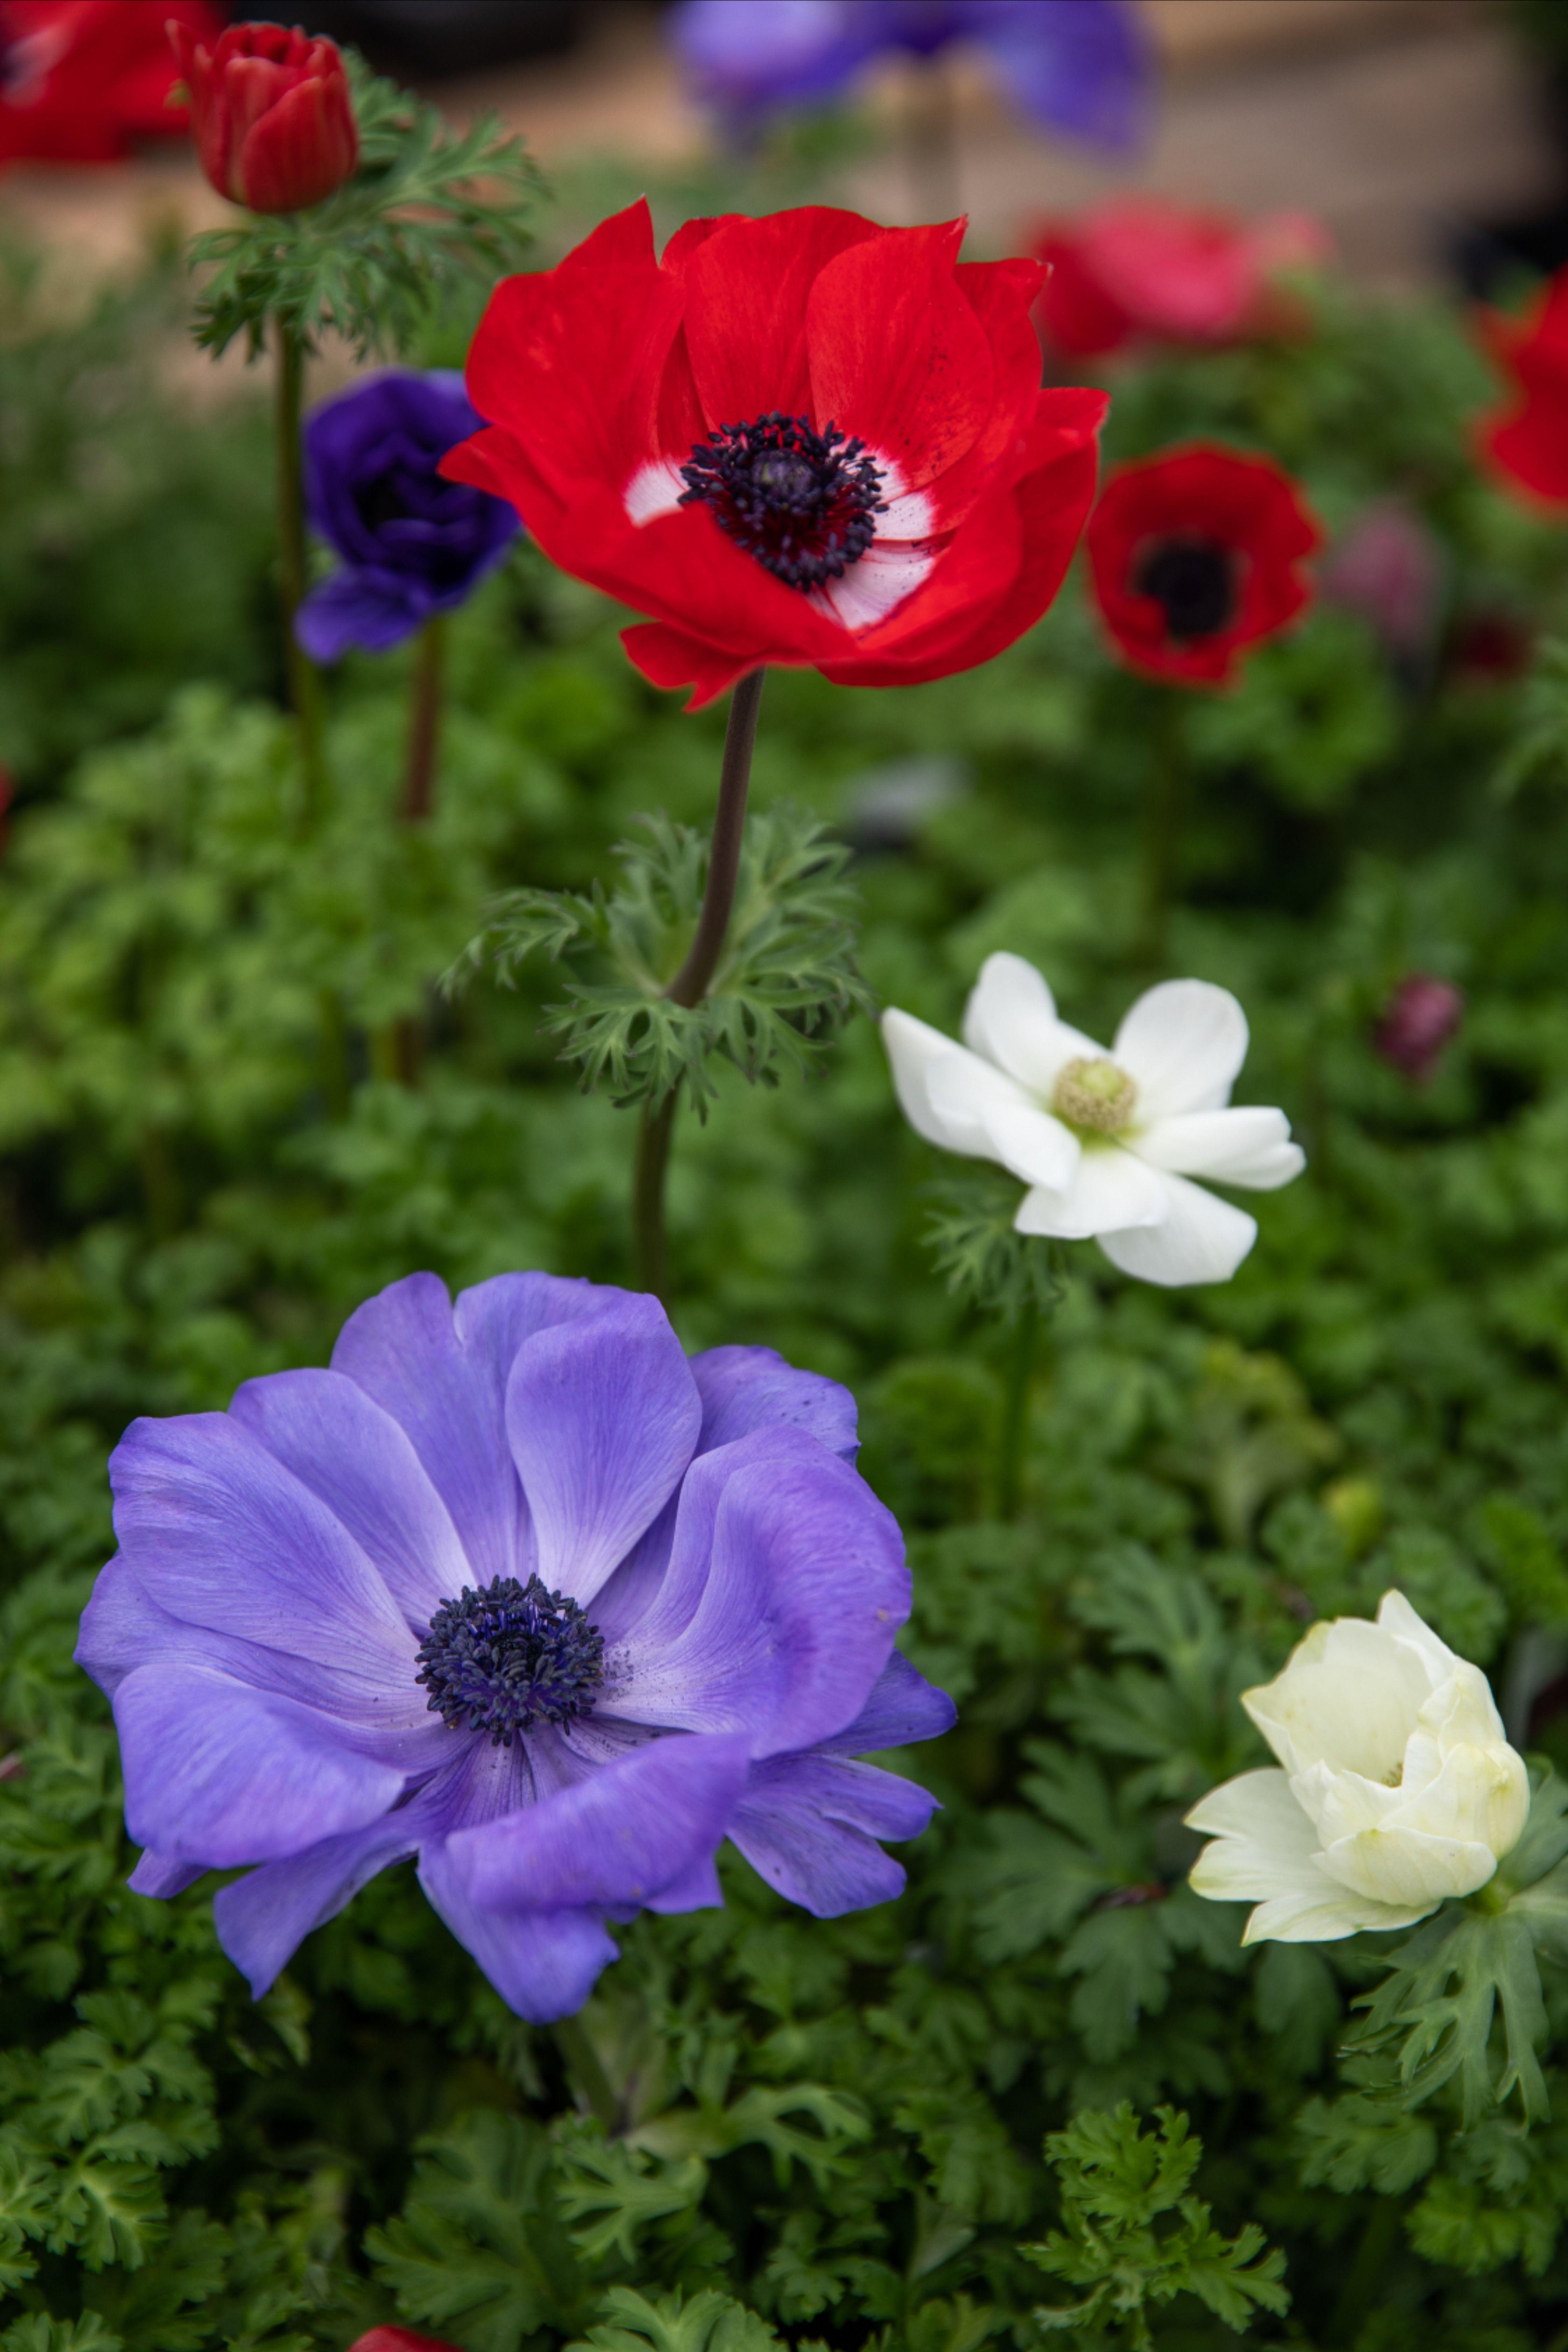 Poppy Flowered Anemone In 2020 Alyssum Plants Beautiful Gardens